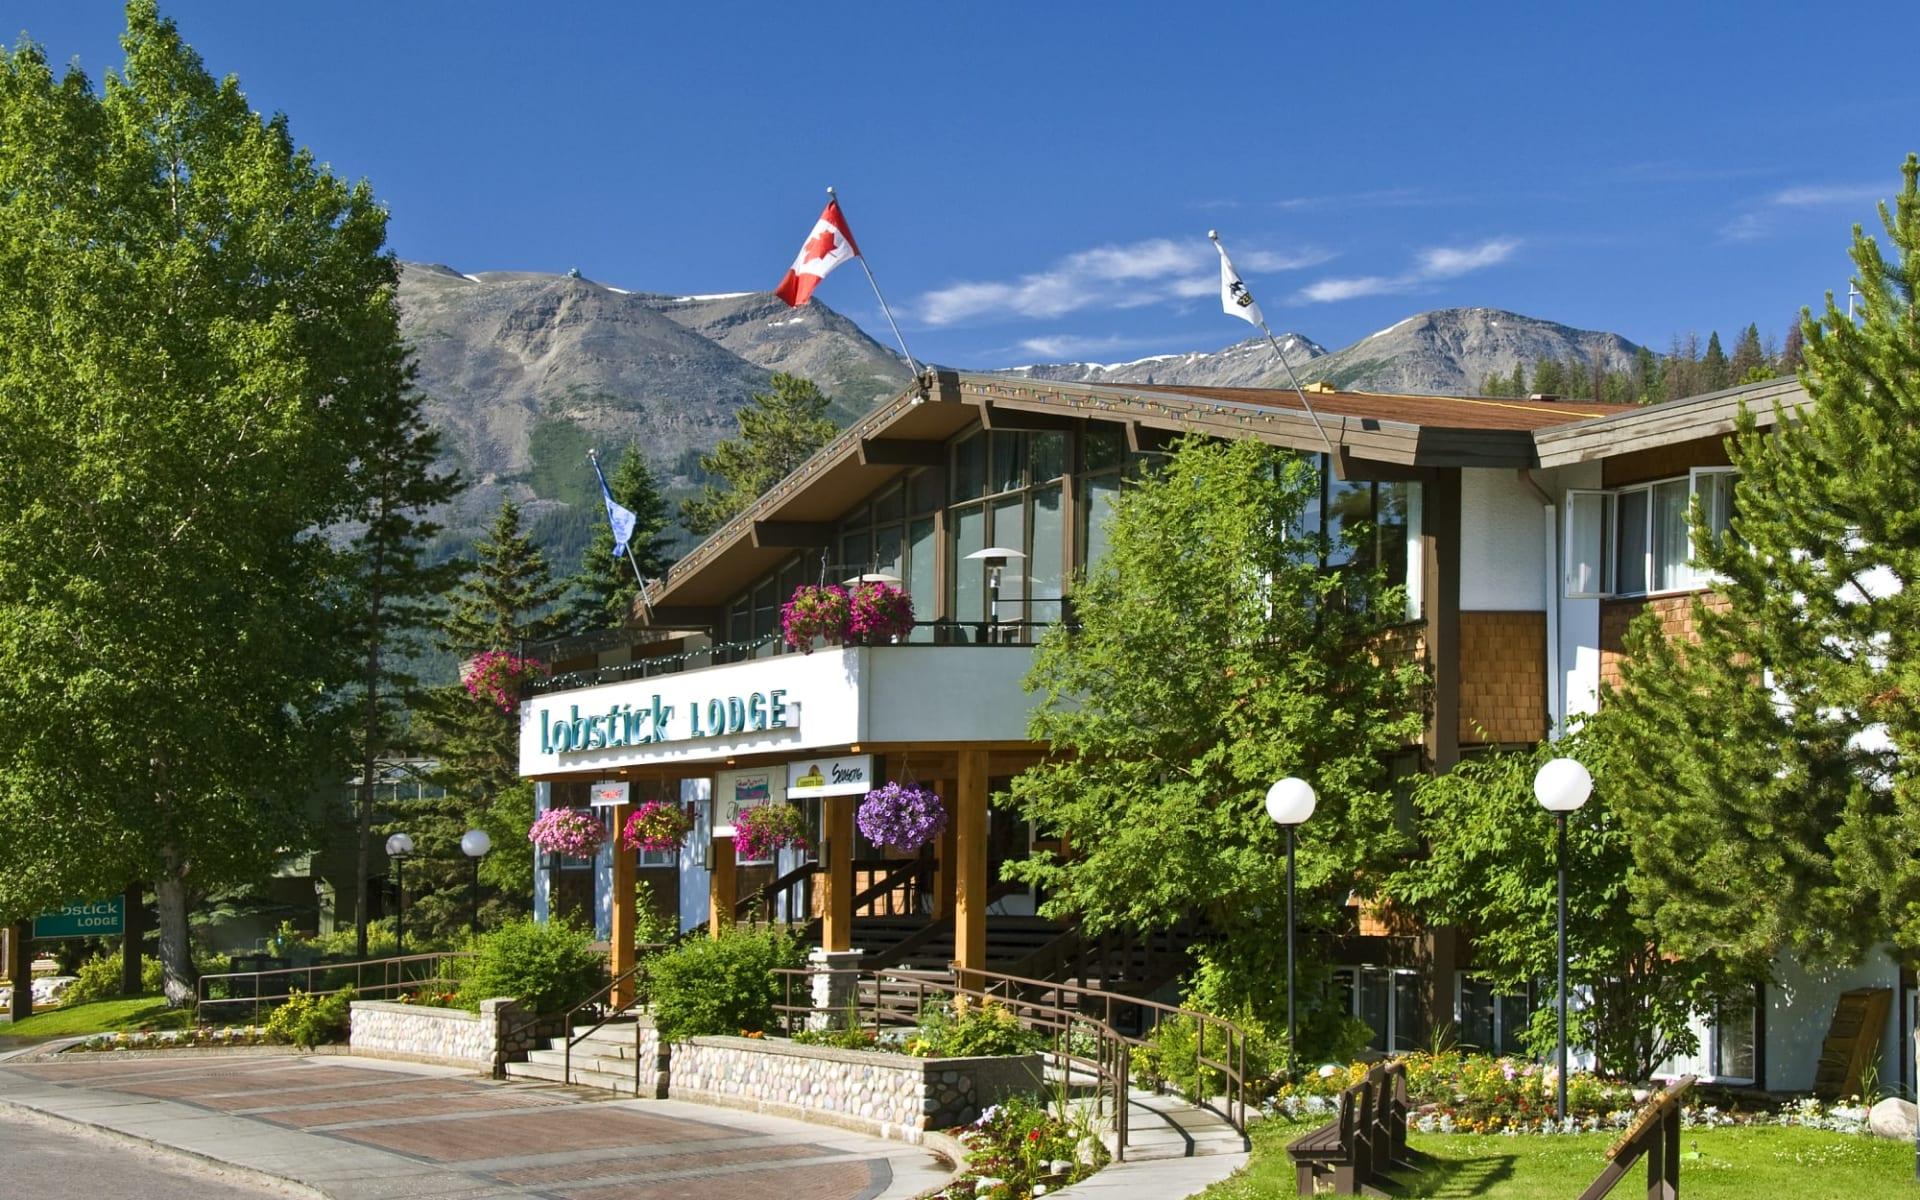 Lobstick Lodge in Jasper:  Lobstick Lodge_Summer2